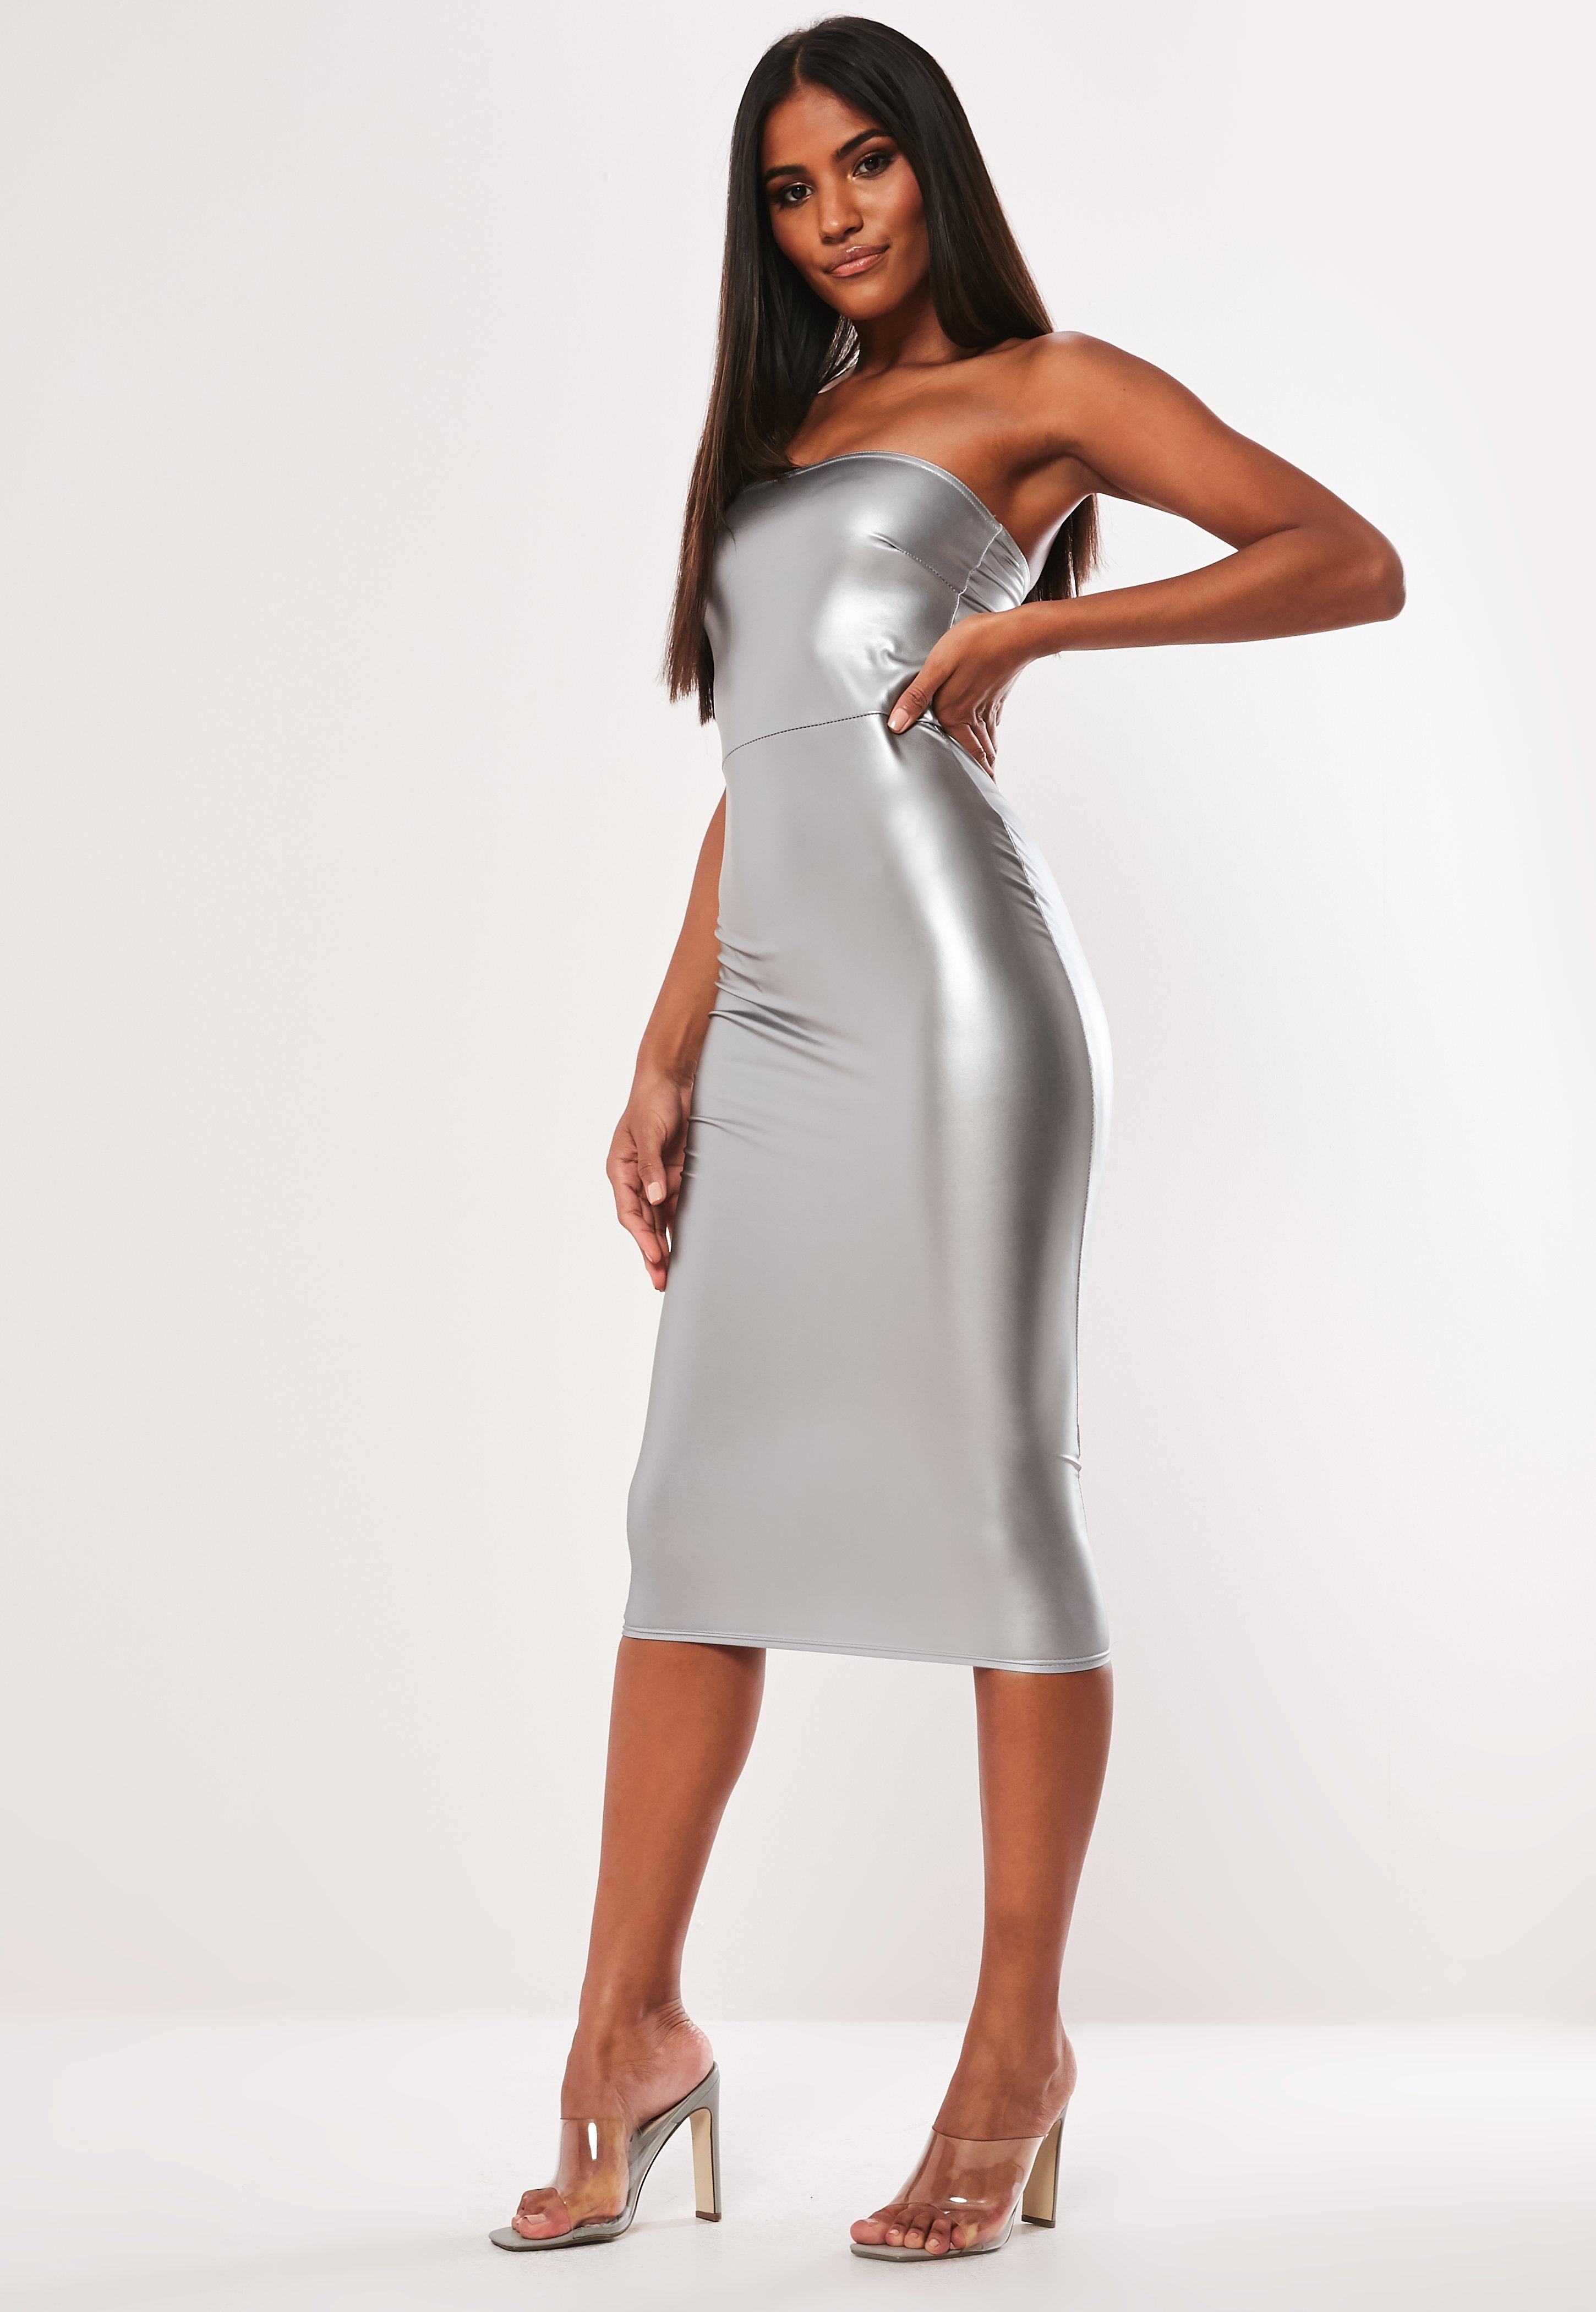 db166cbbb2 Silver Faux Leather Bandeau Bodycon Midi Dress